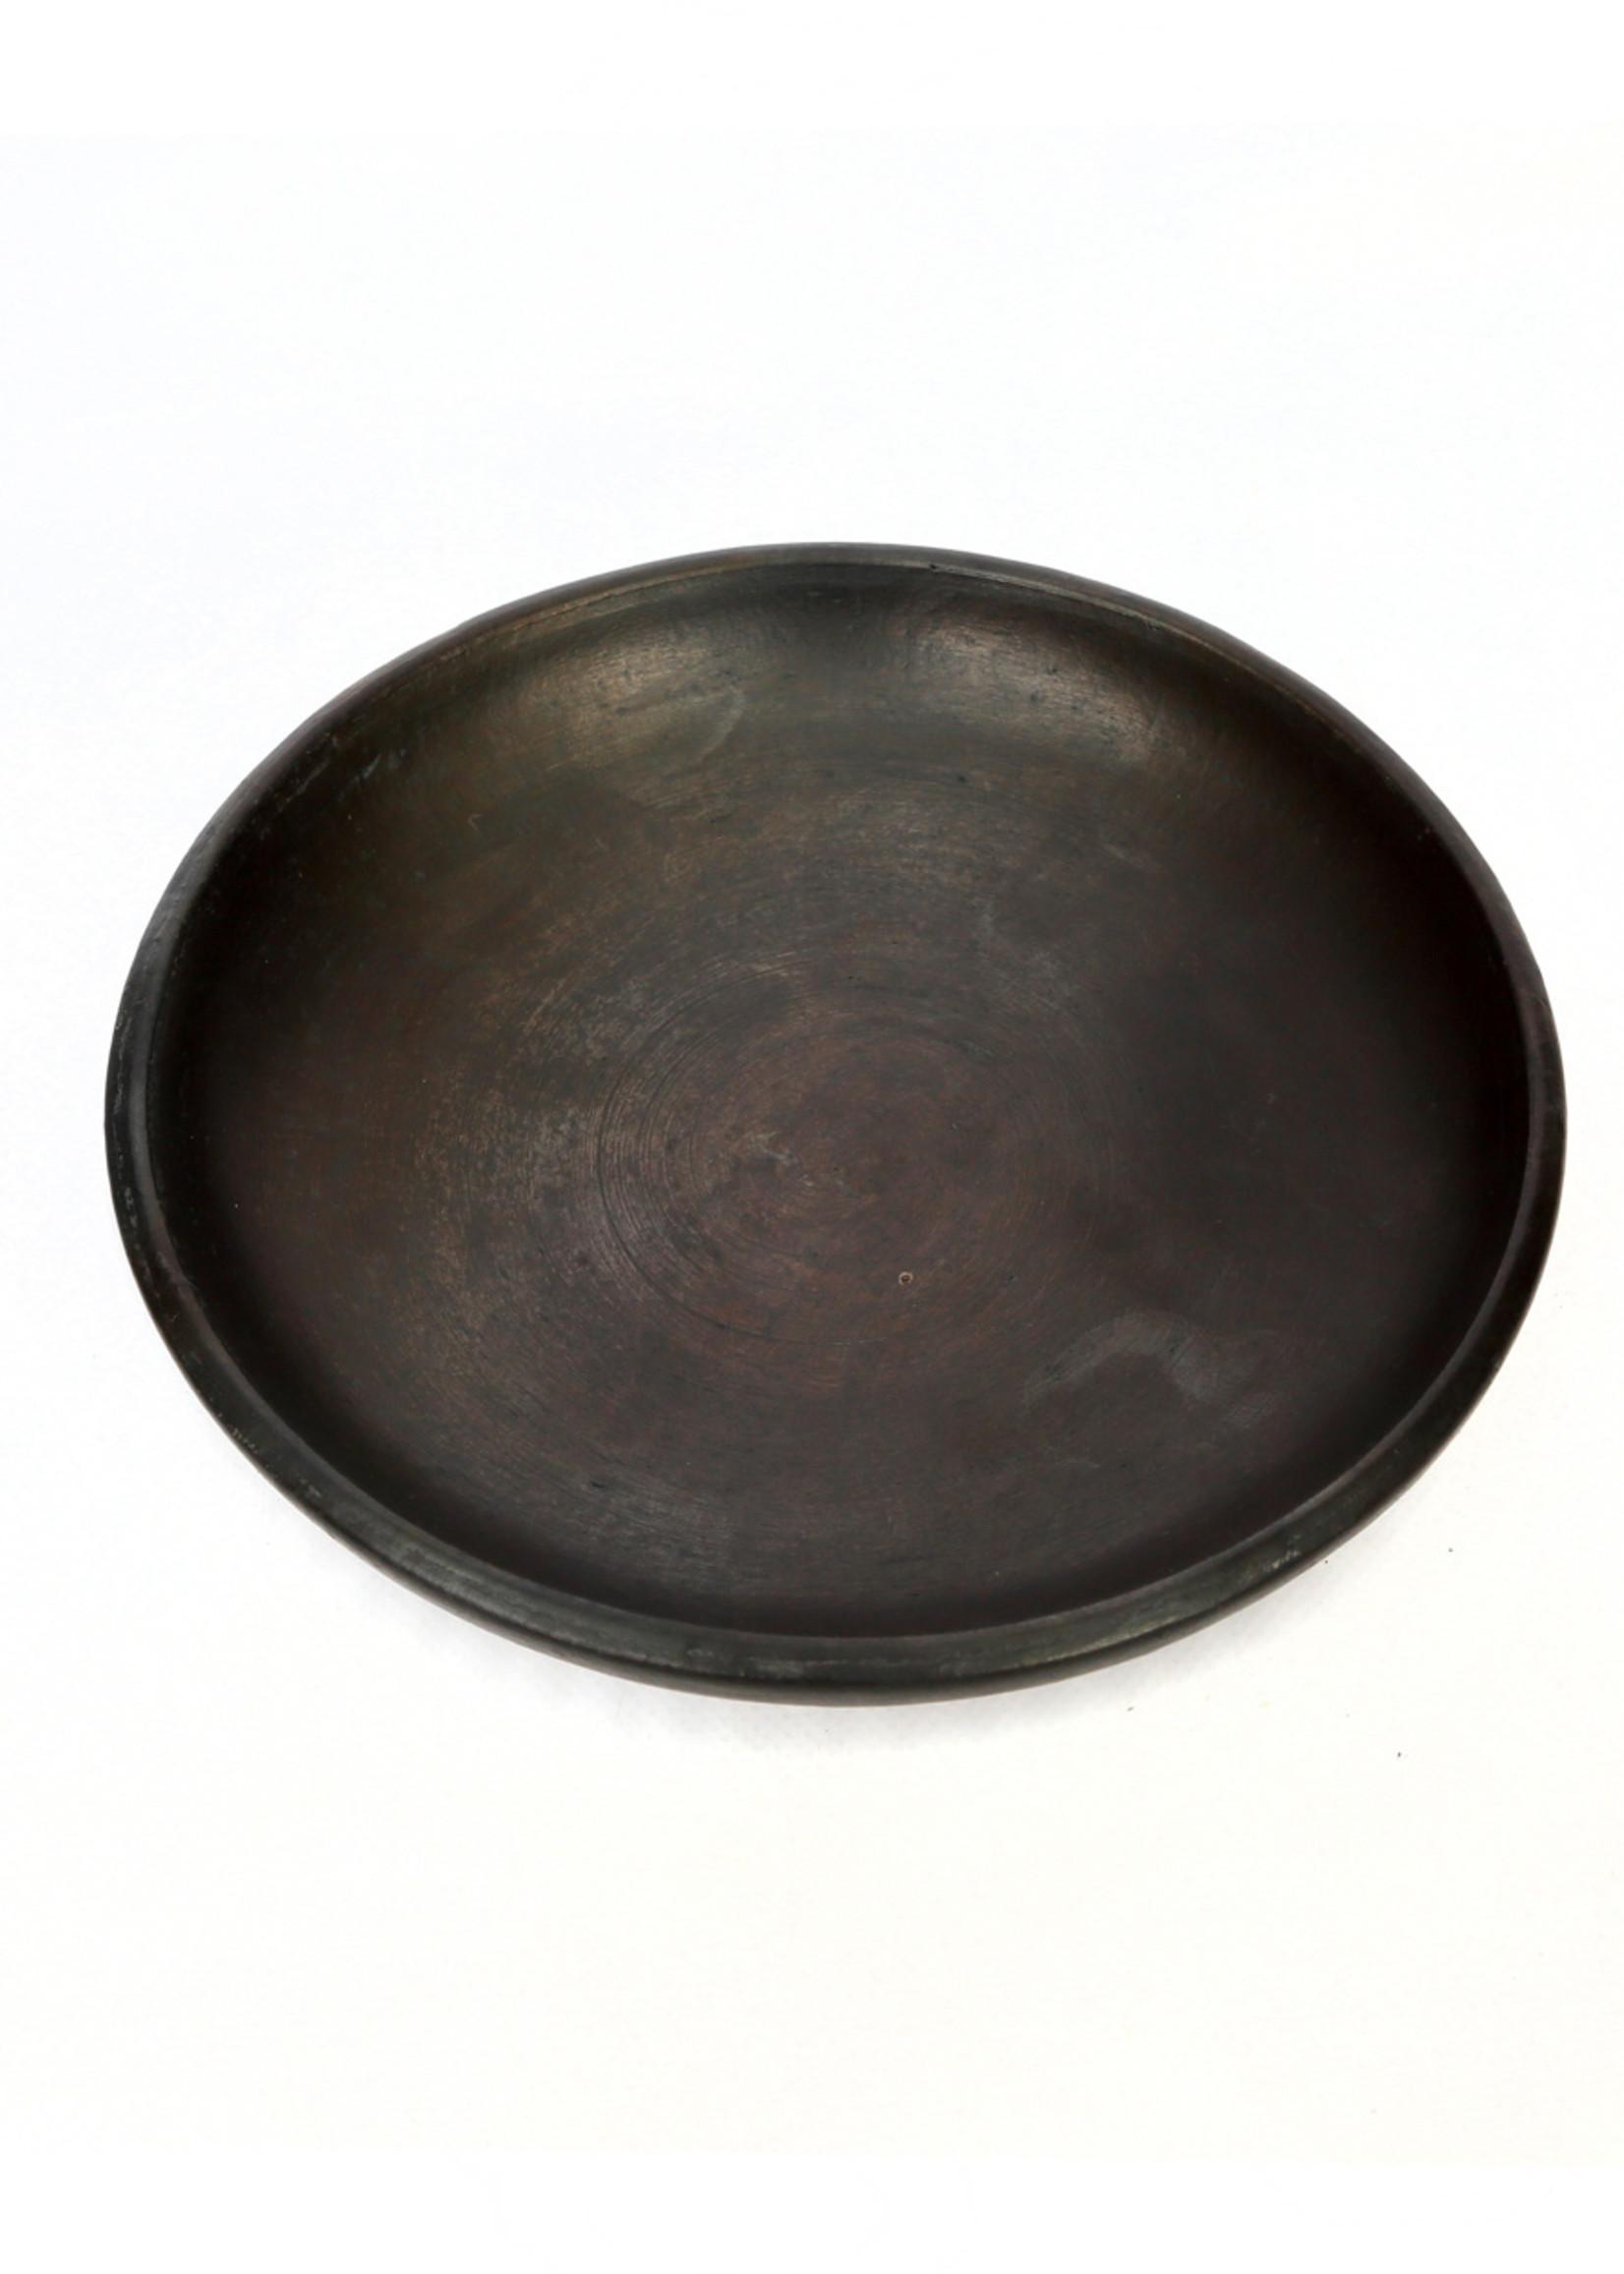 The Burned Classic Plate - Black - M